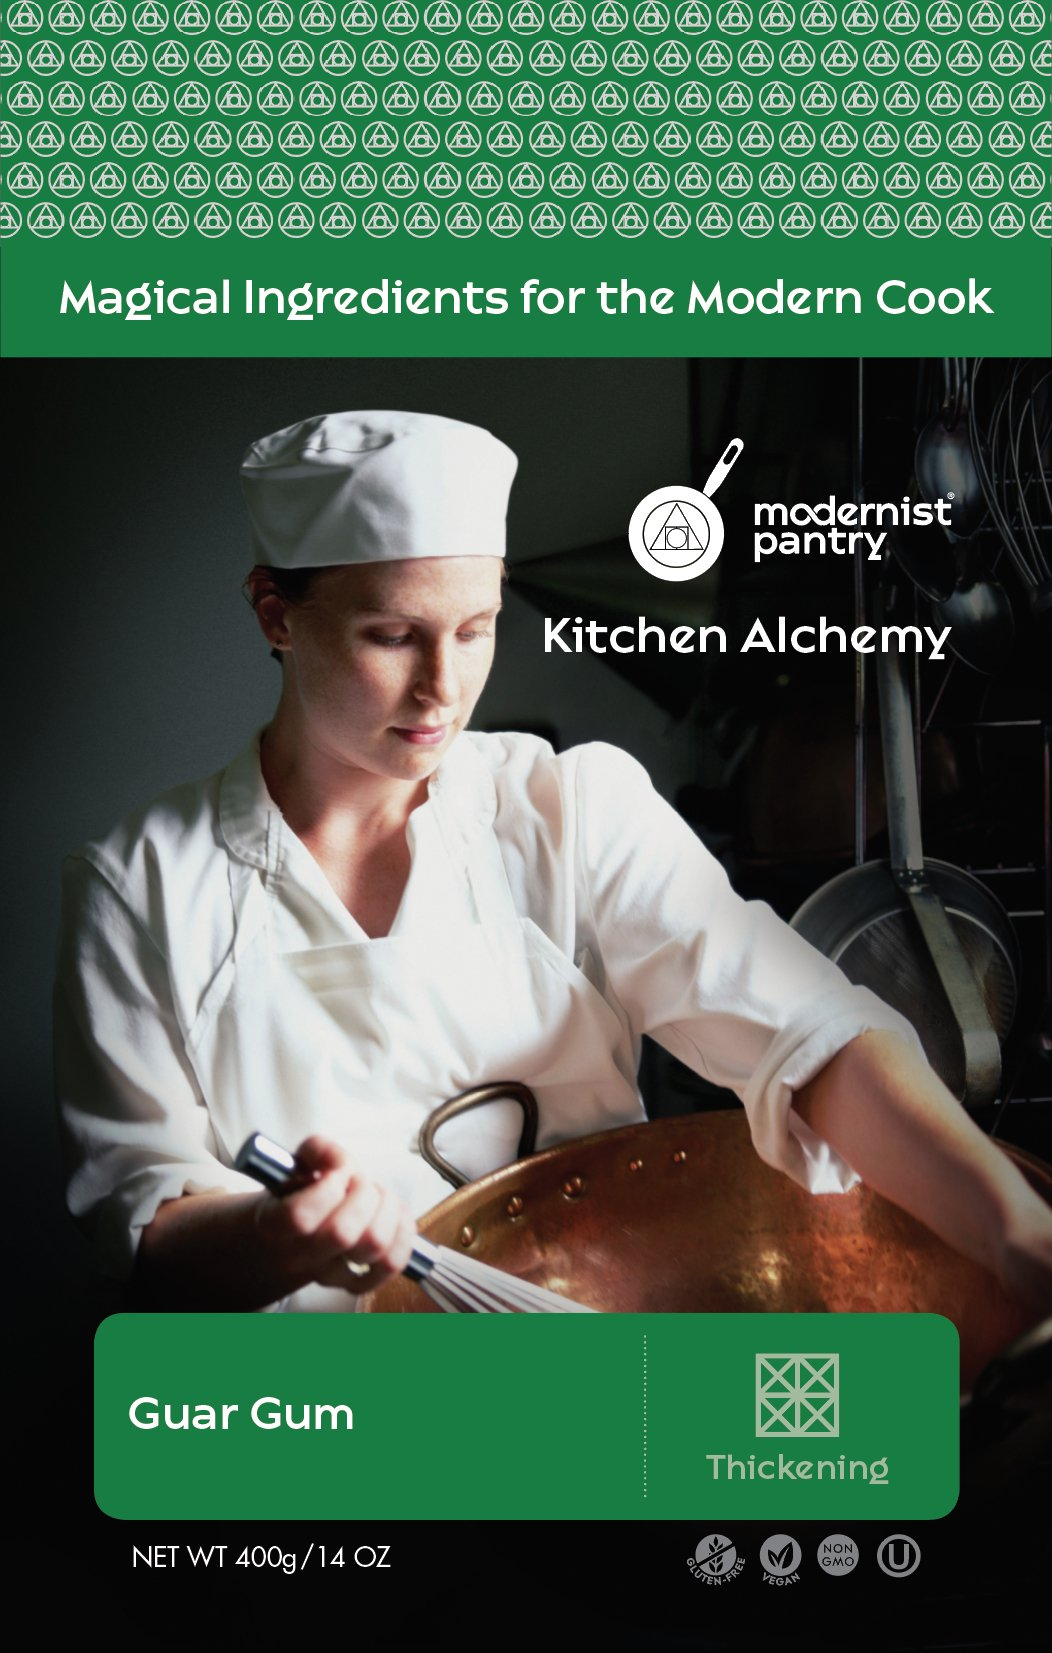 Food Grade Guar Gum (Molecular Gastronomy) ⊘ Non-GMO ☮ Vegan ✡ OU Kosher Certified - 400g/14oz